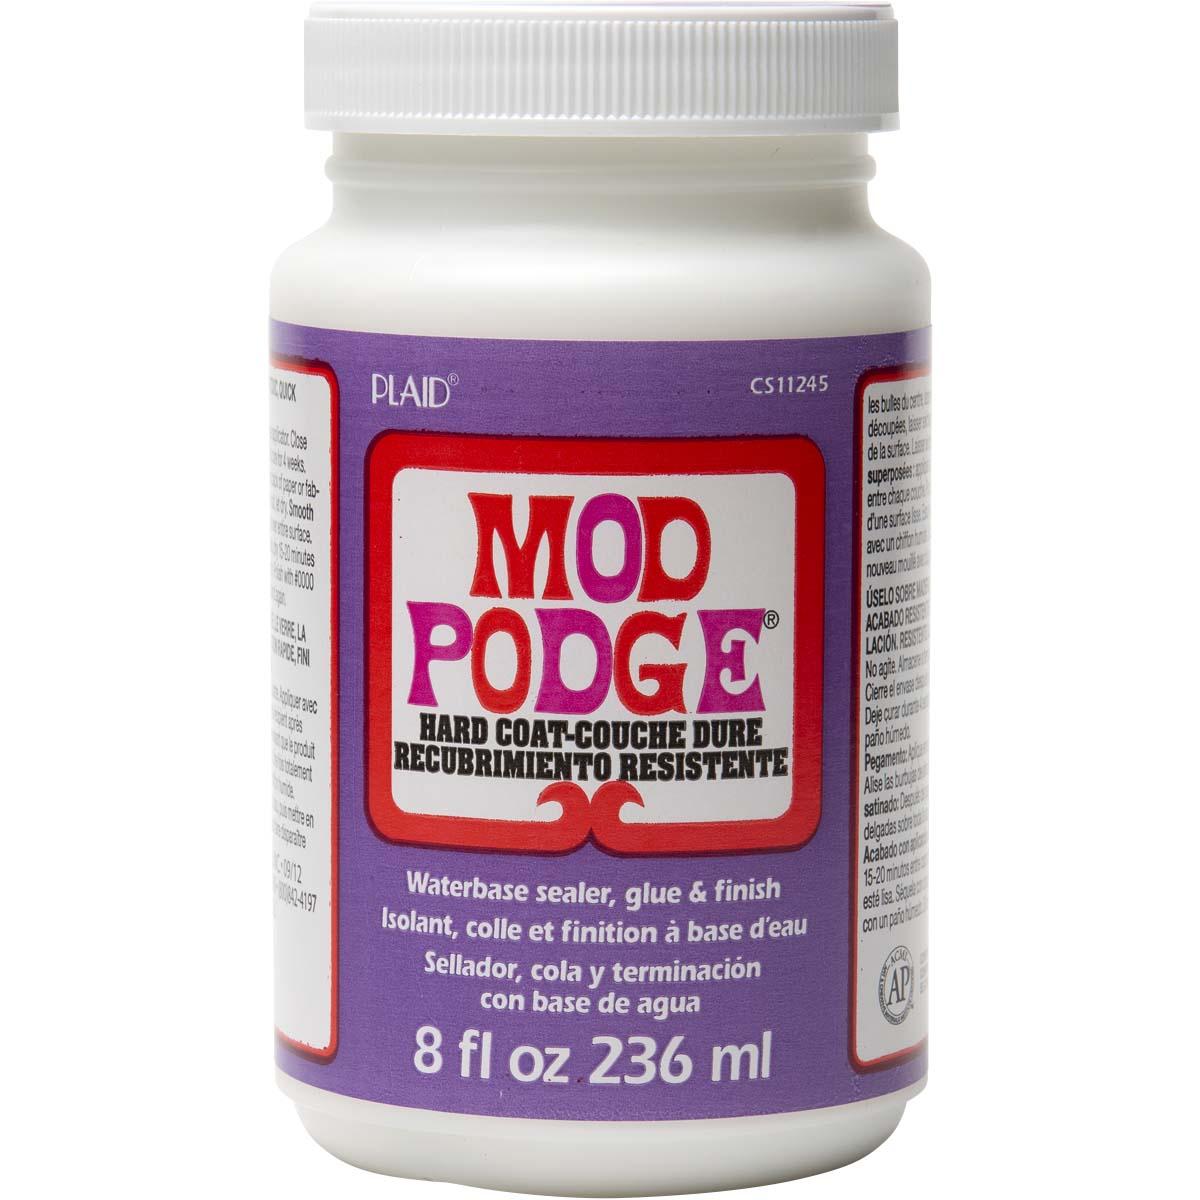 Mod Podge ® Hard Coat, 8 oz. - CS11245